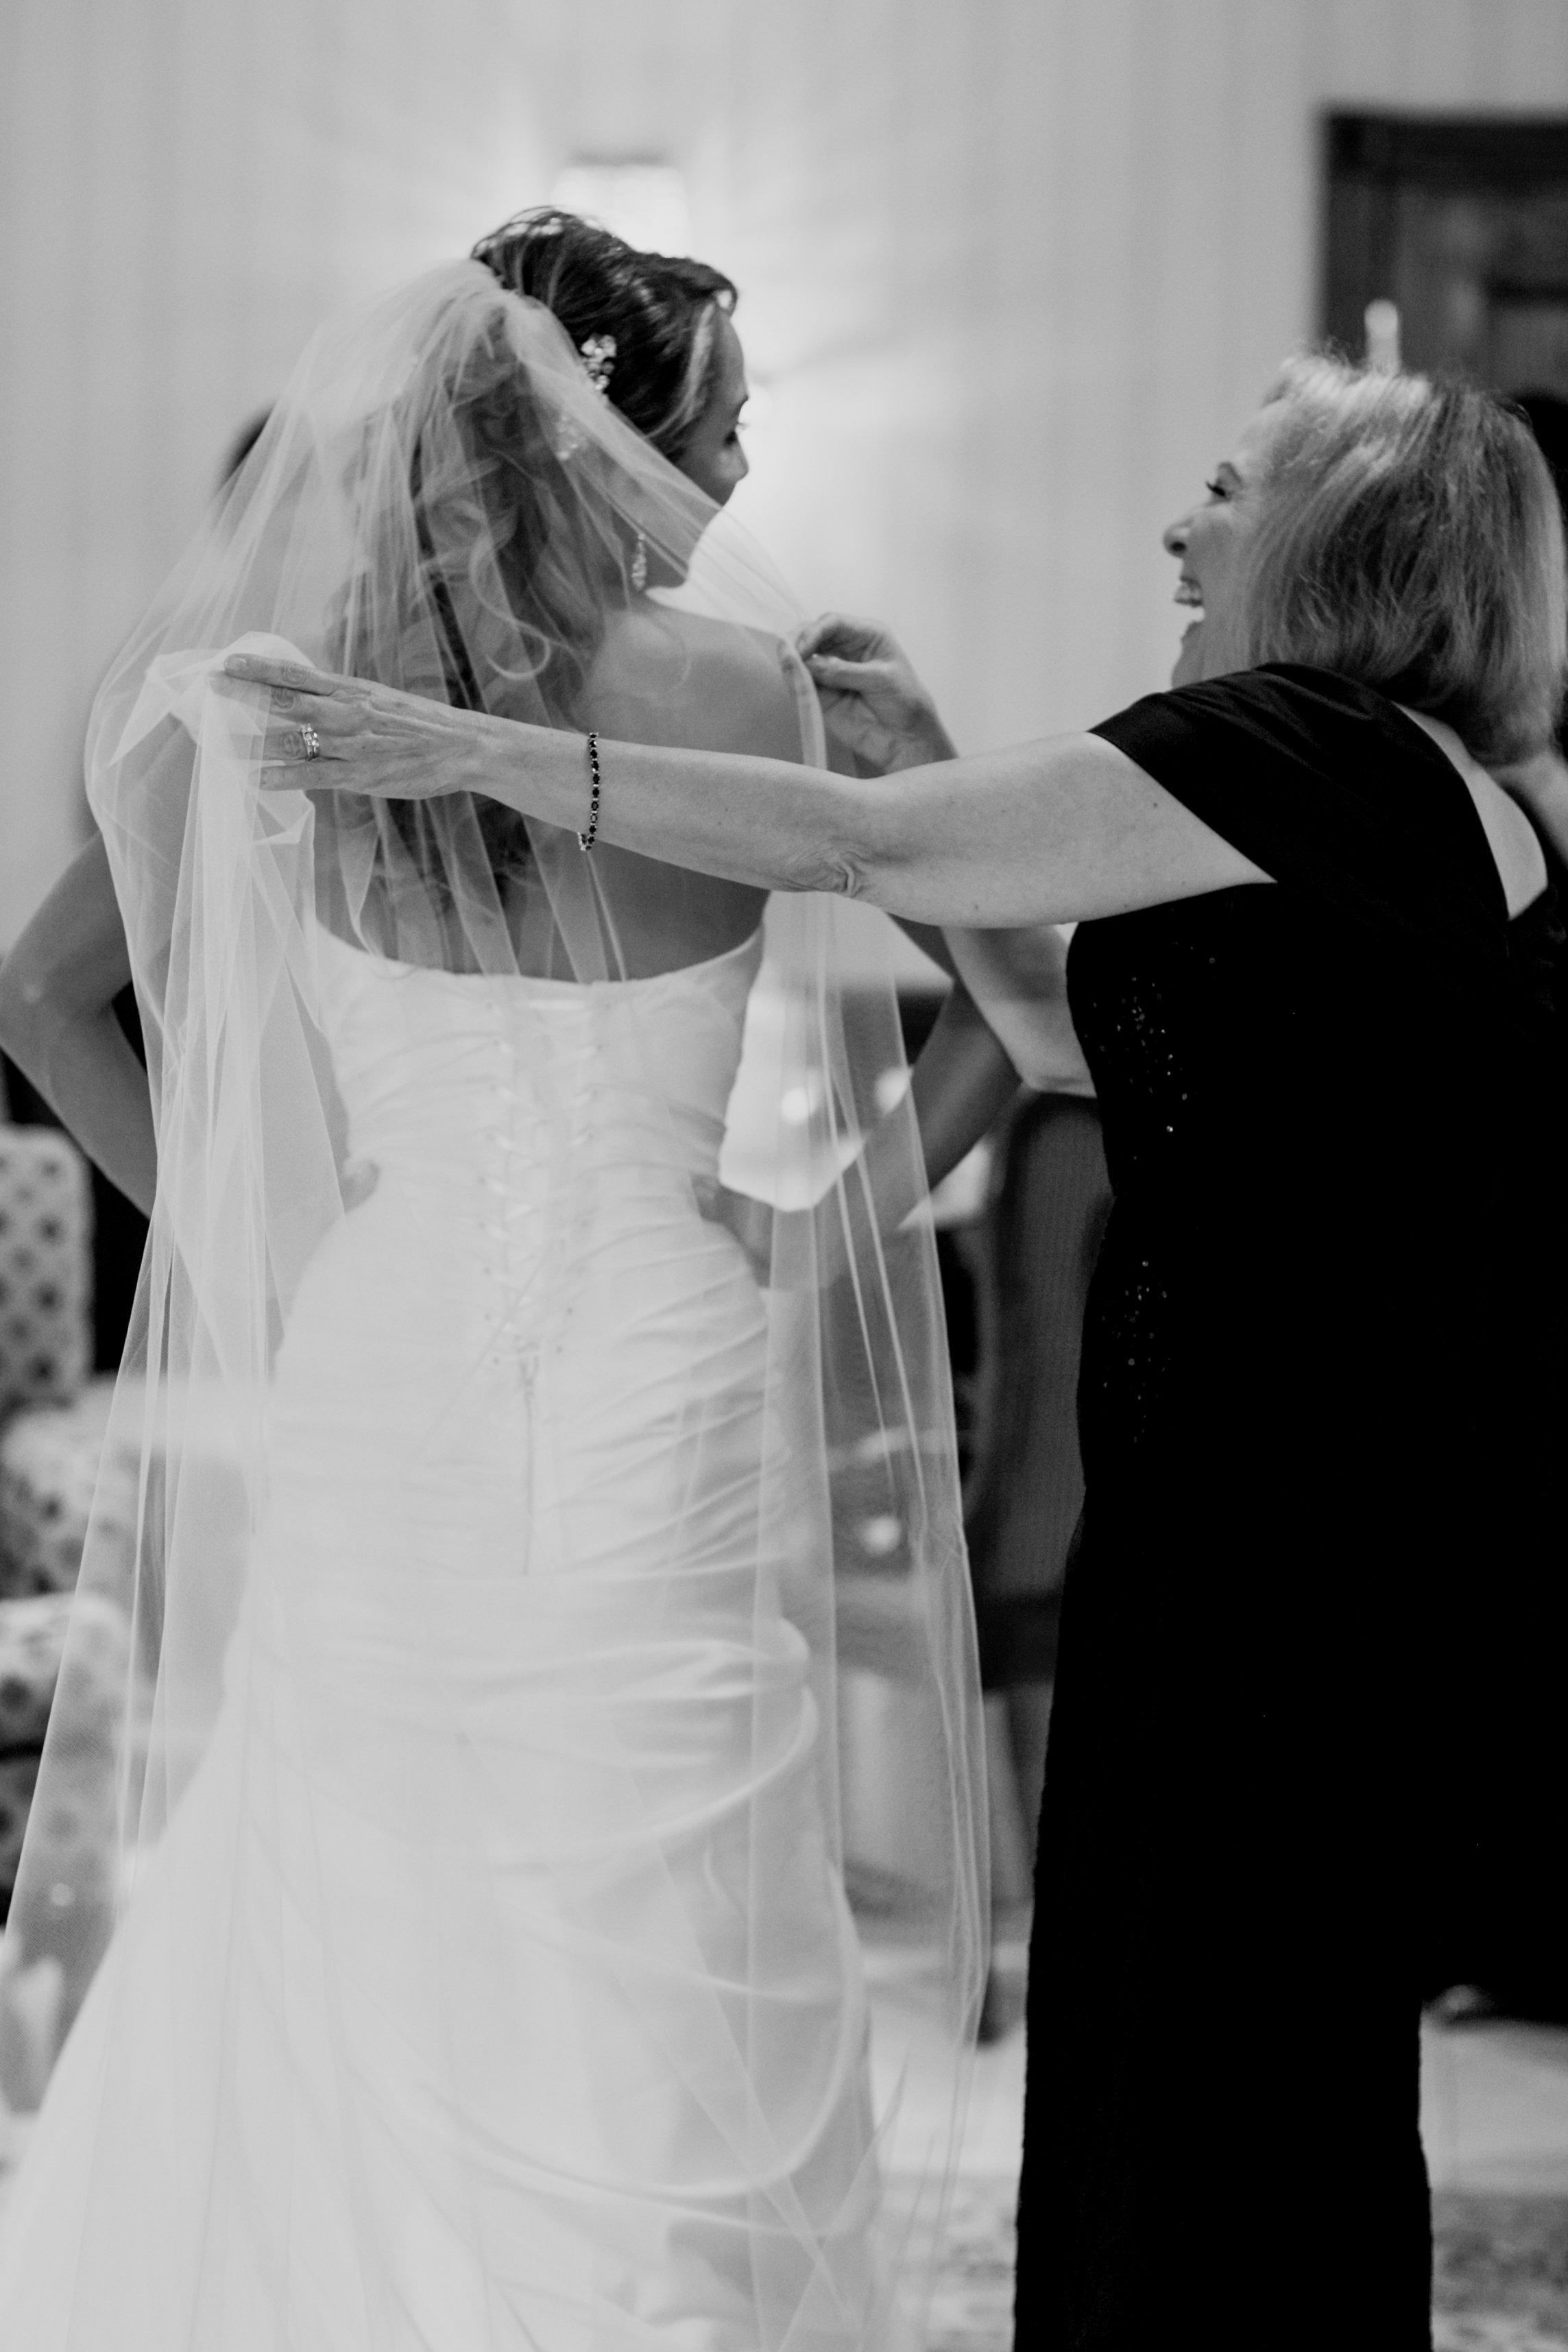 Ceci_New_York_Custom_Invitation_ New_Jersey_Wedding_Luxury_Personalized_Ceci_Style_Bride_Foil_Stamping14.jpg